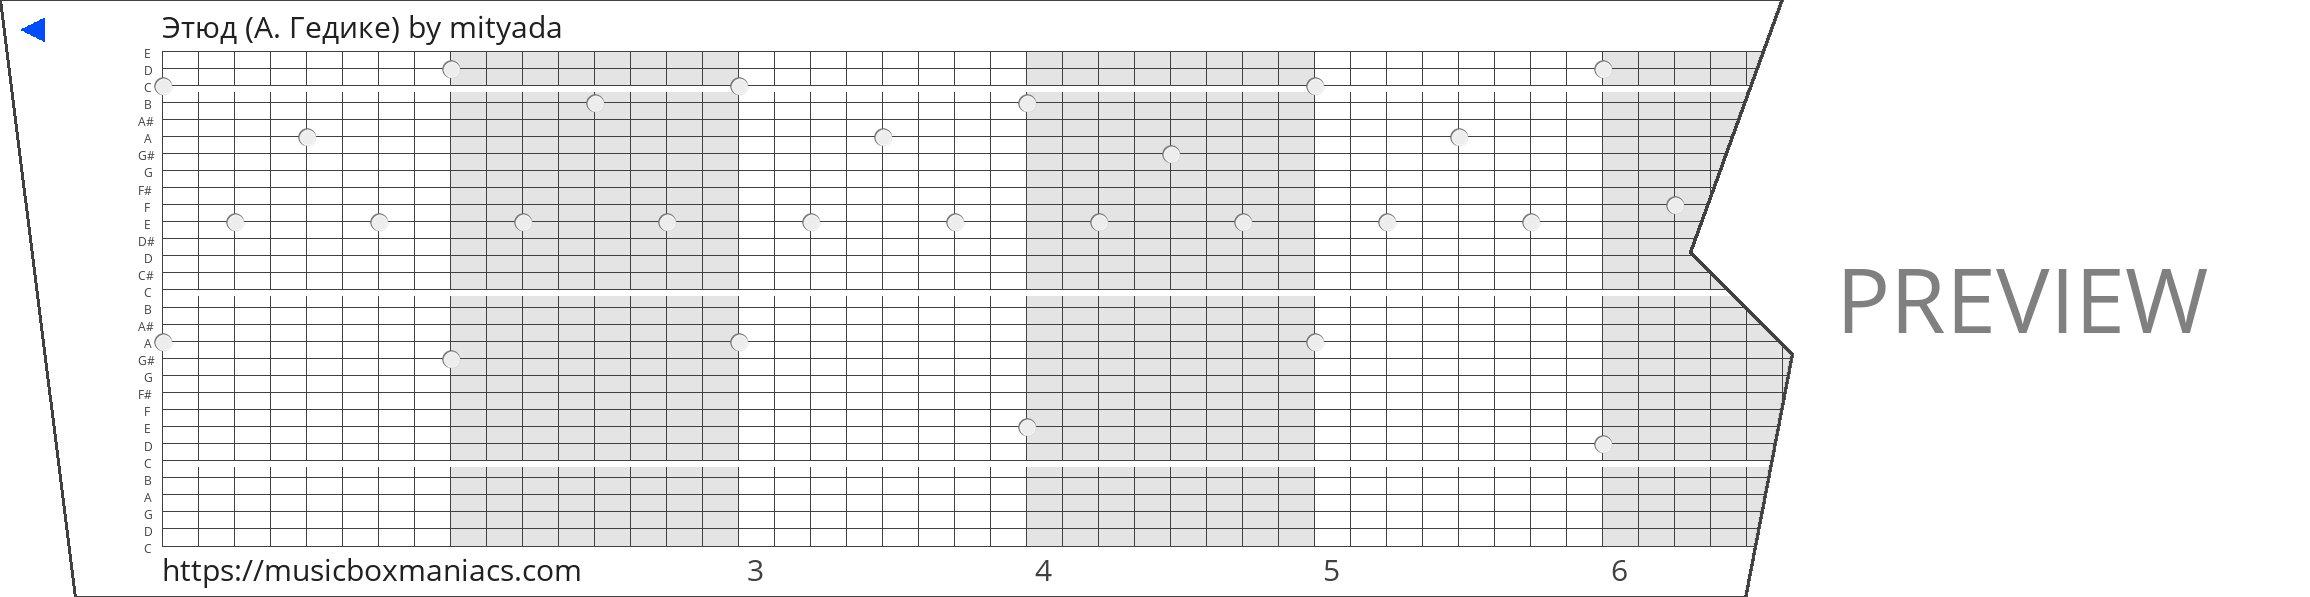 Этюд (А. Гедике) 30 note music box paper strip